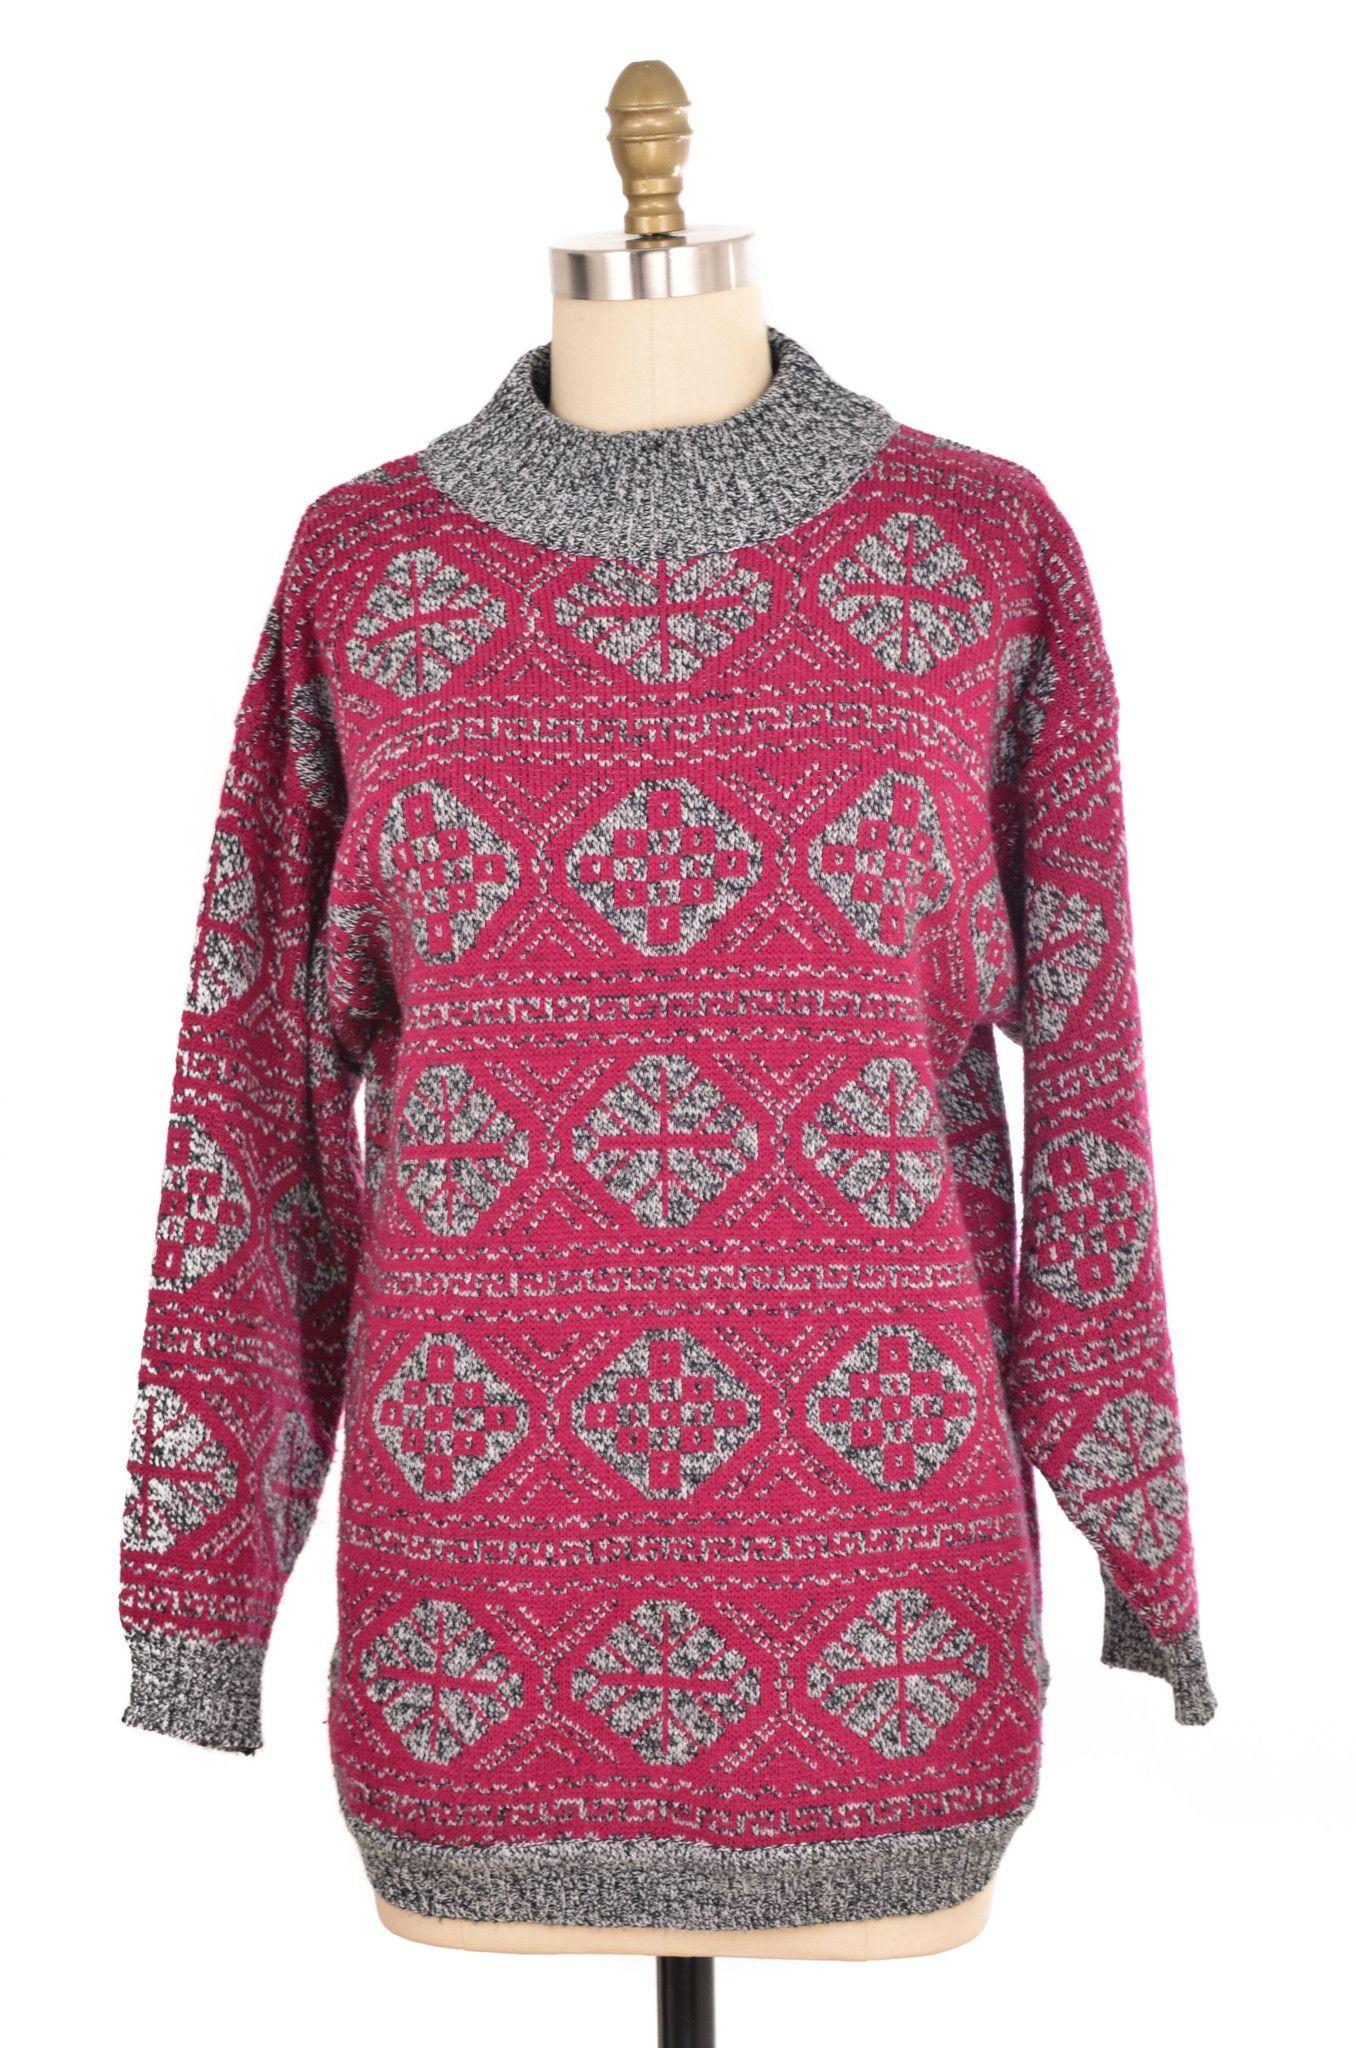 80s Purple Batwing Chunky Knit Long Cardigan Duster Sweater Size M | Sweaters, Cardigan, Knit